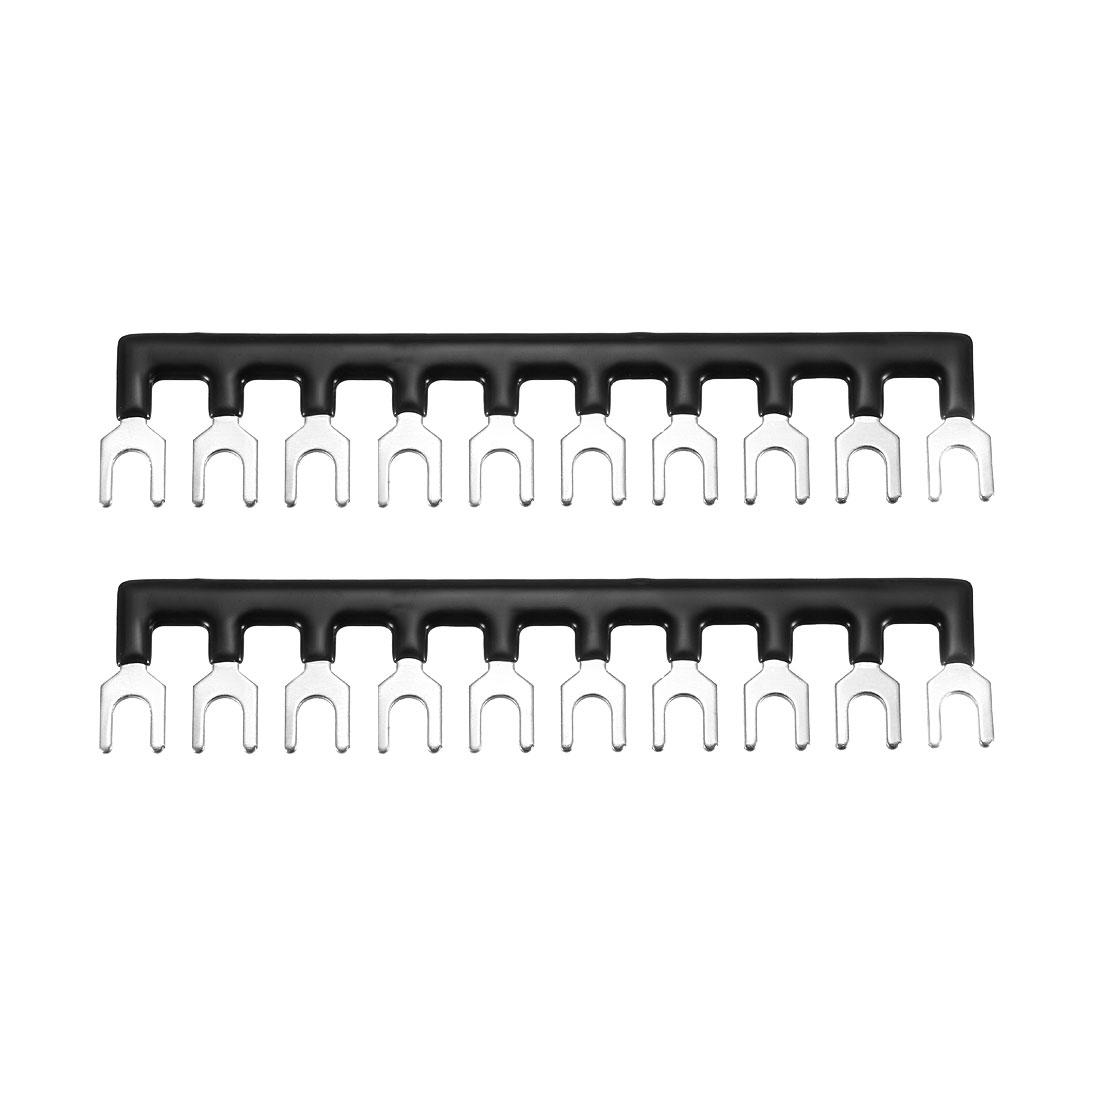 600V 20A 10 Positions Terminal Block Barrier Strip Fork Type Black 2 Pcs